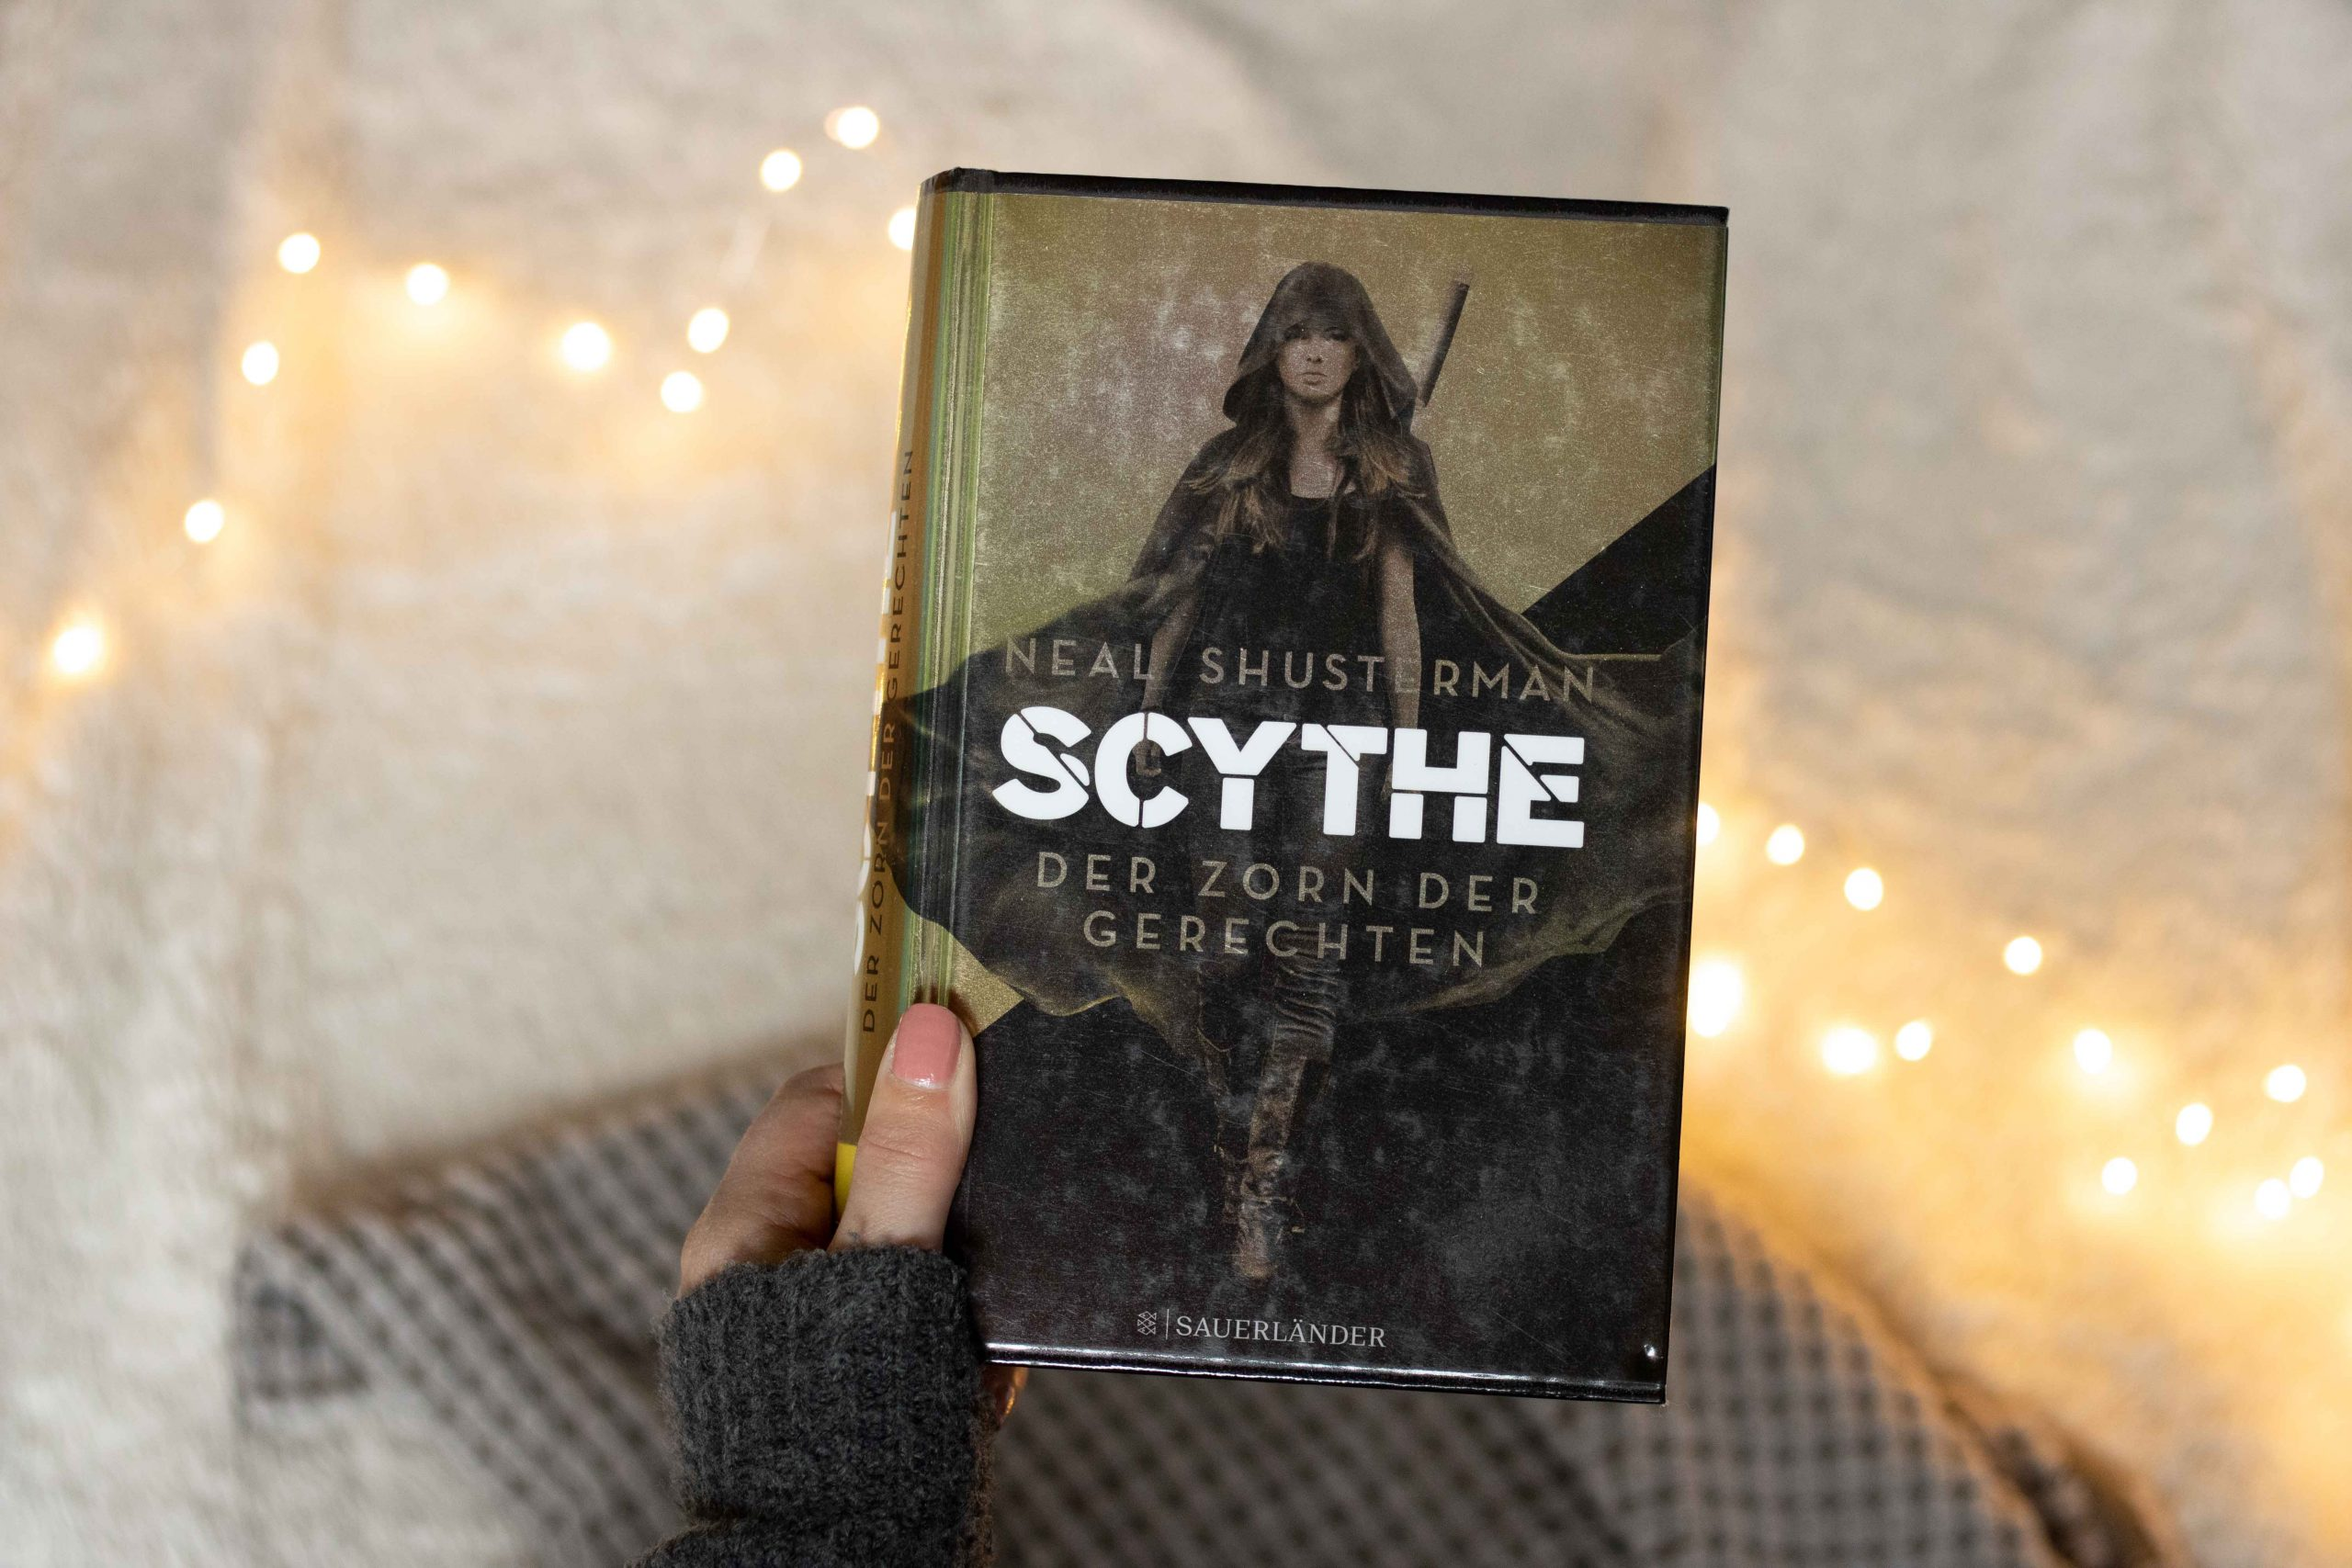 Scythe – Der Zorn der Gerechten | Neal Shusterman